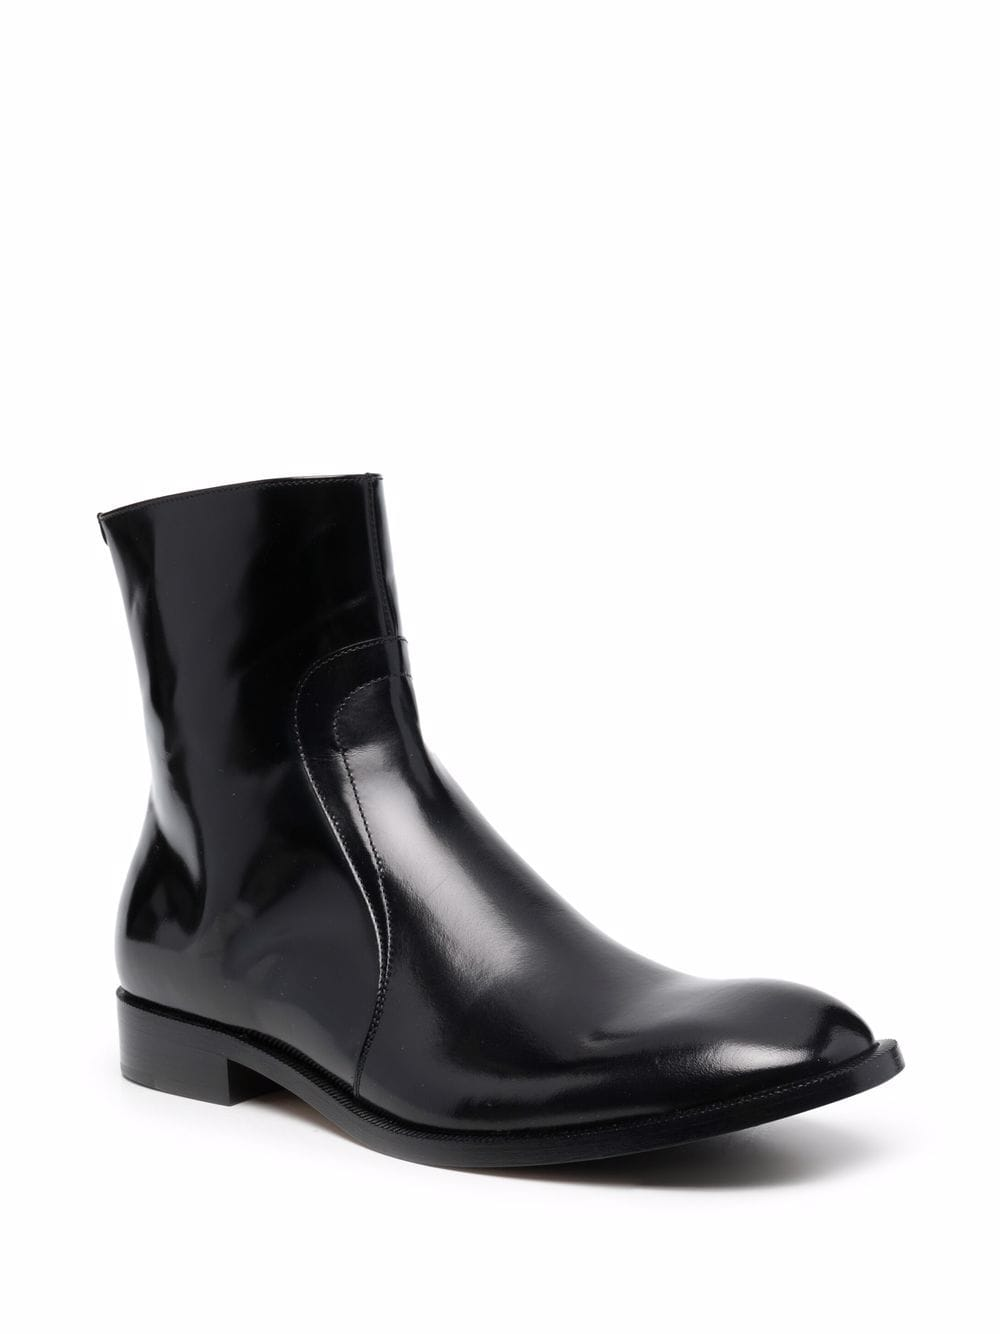 leather boots man black MAISON MARGIELA | Boots | S37WU0415 P3827H8396